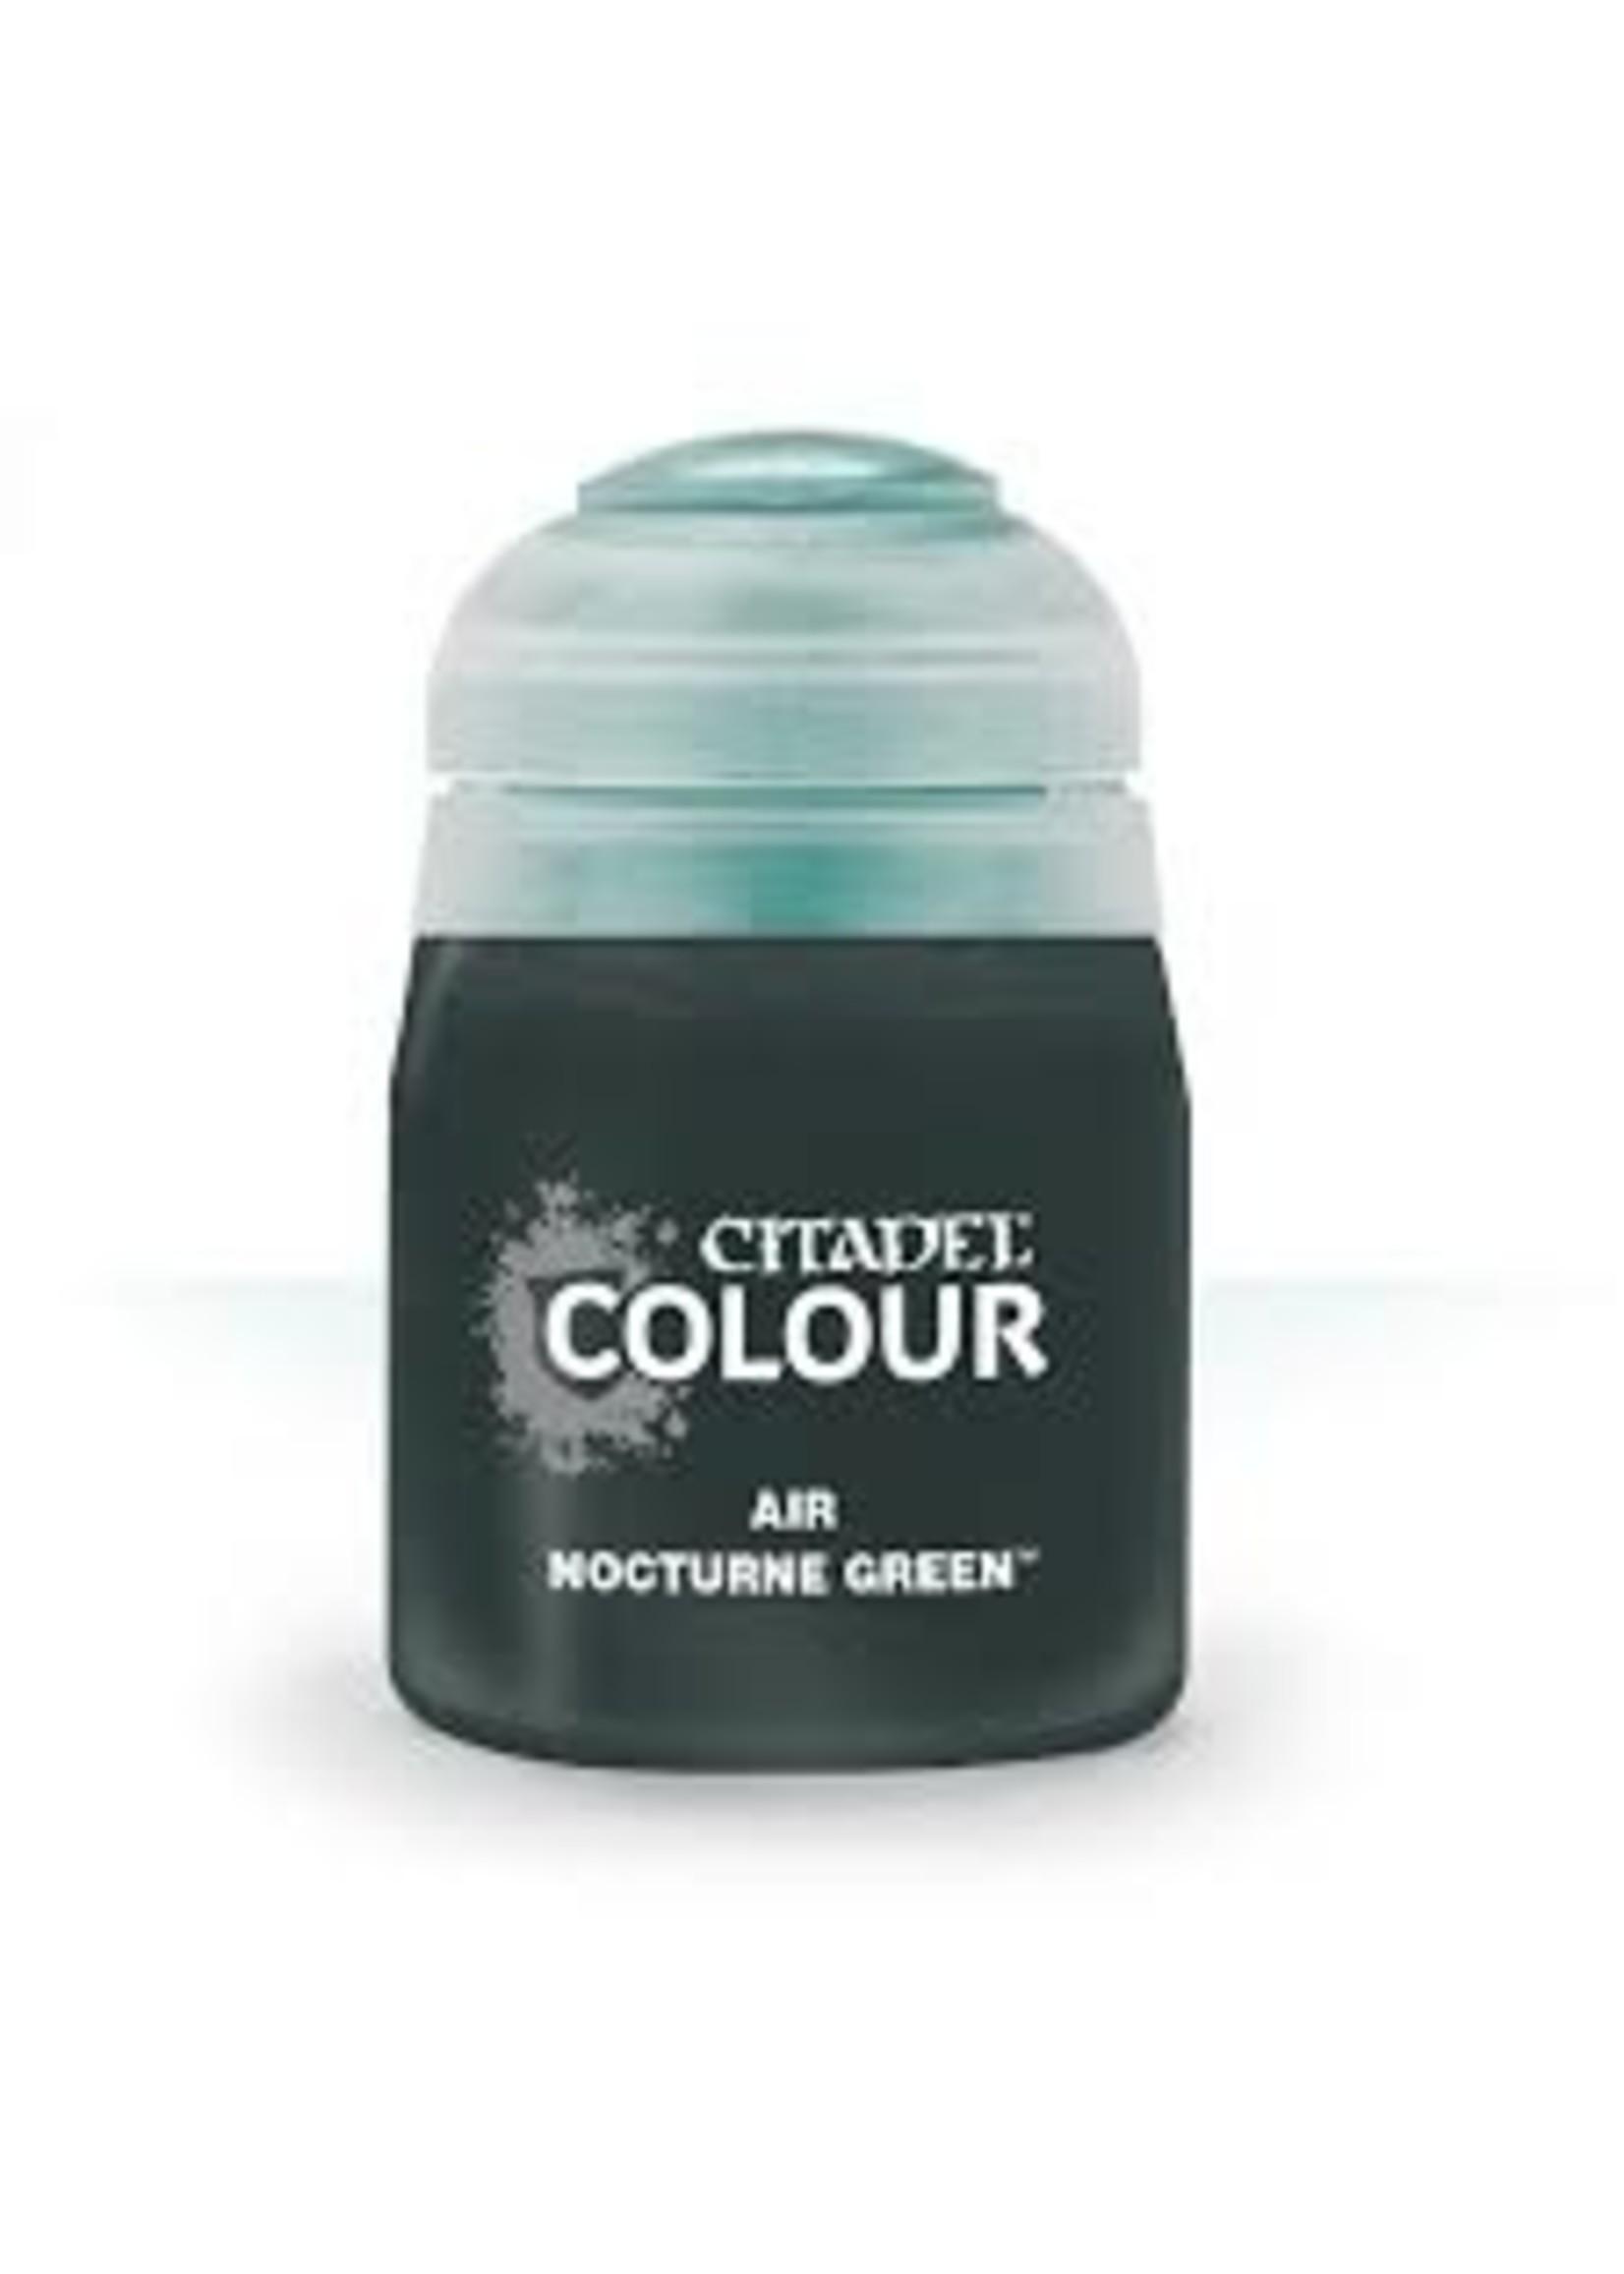 Air:Nocturne Green (24Ml)